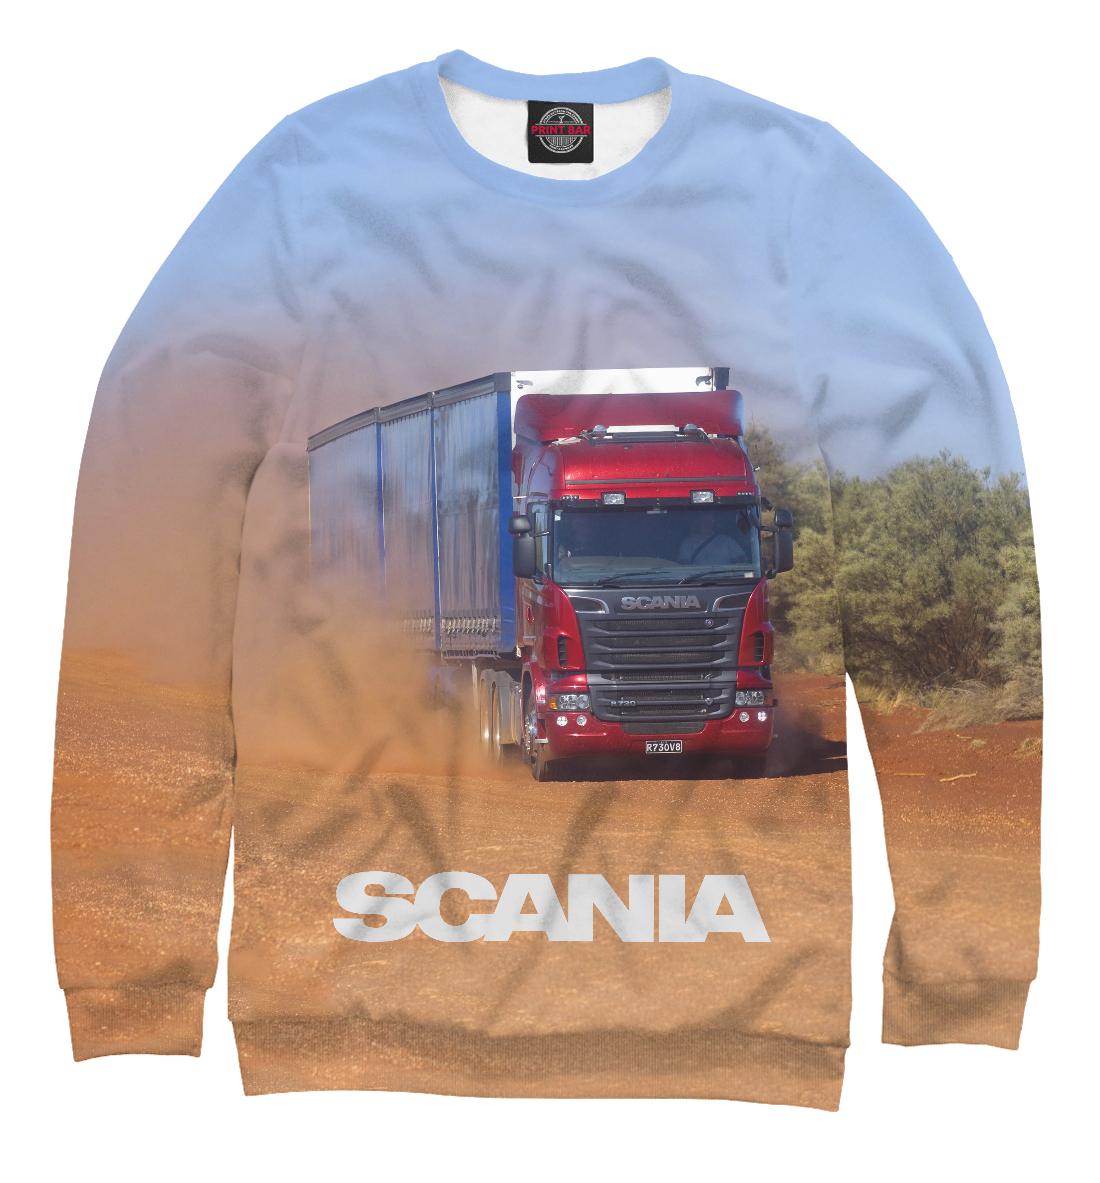 Купить Scania, Printbar, Свитшоты, GRZ-594771-swi-1